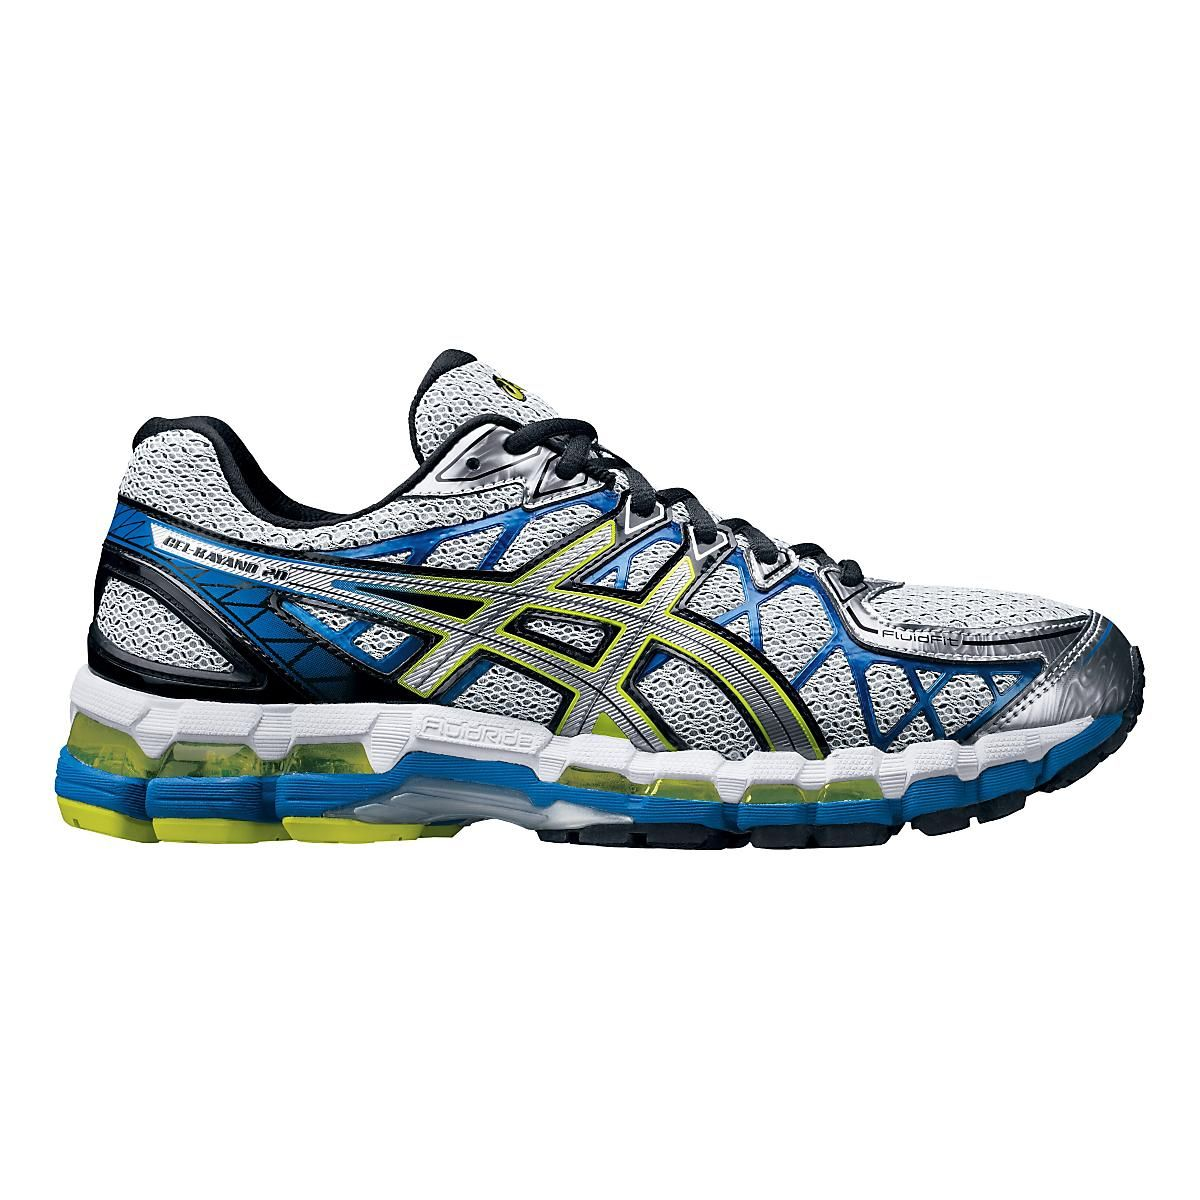 Gel Kayano 20 Running Shoes For Men Asics Running Shoes Asics